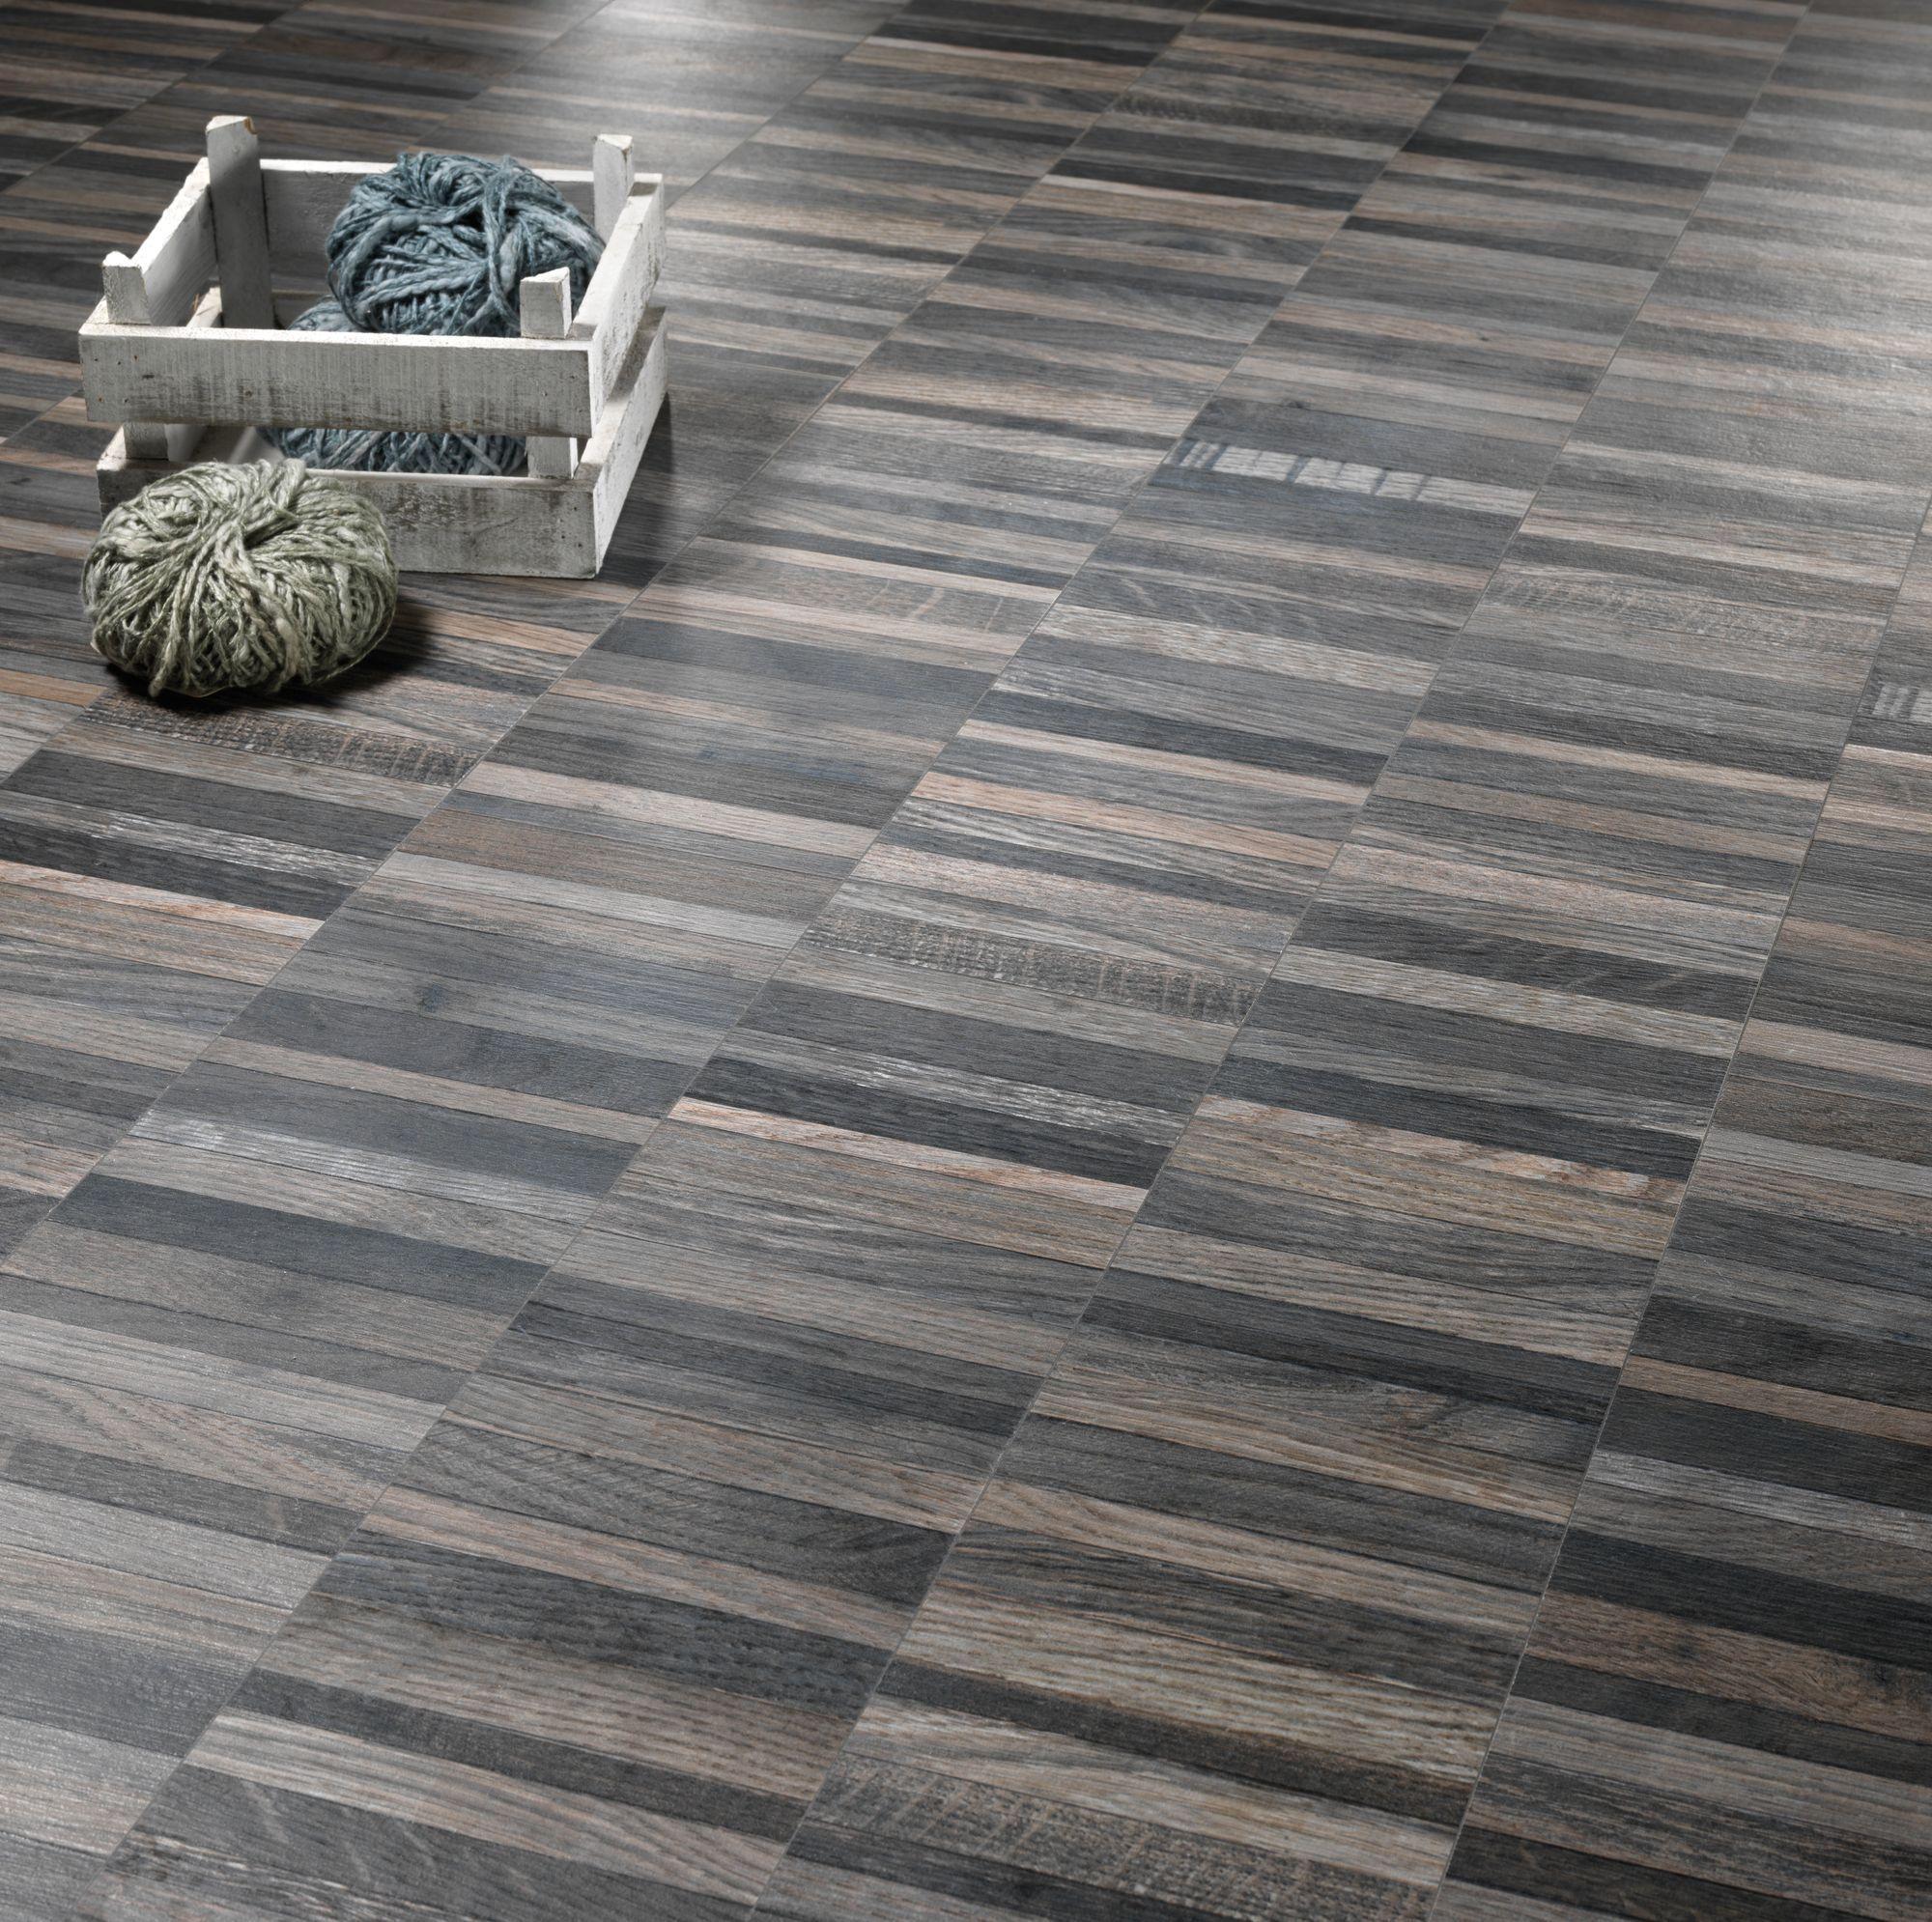 Settecento Mosaici E Ceramiche D Arte Floor And Wall Ceramic Tiles Mosaic Wallpaper Ceramic Tiles Wood Wallpaper